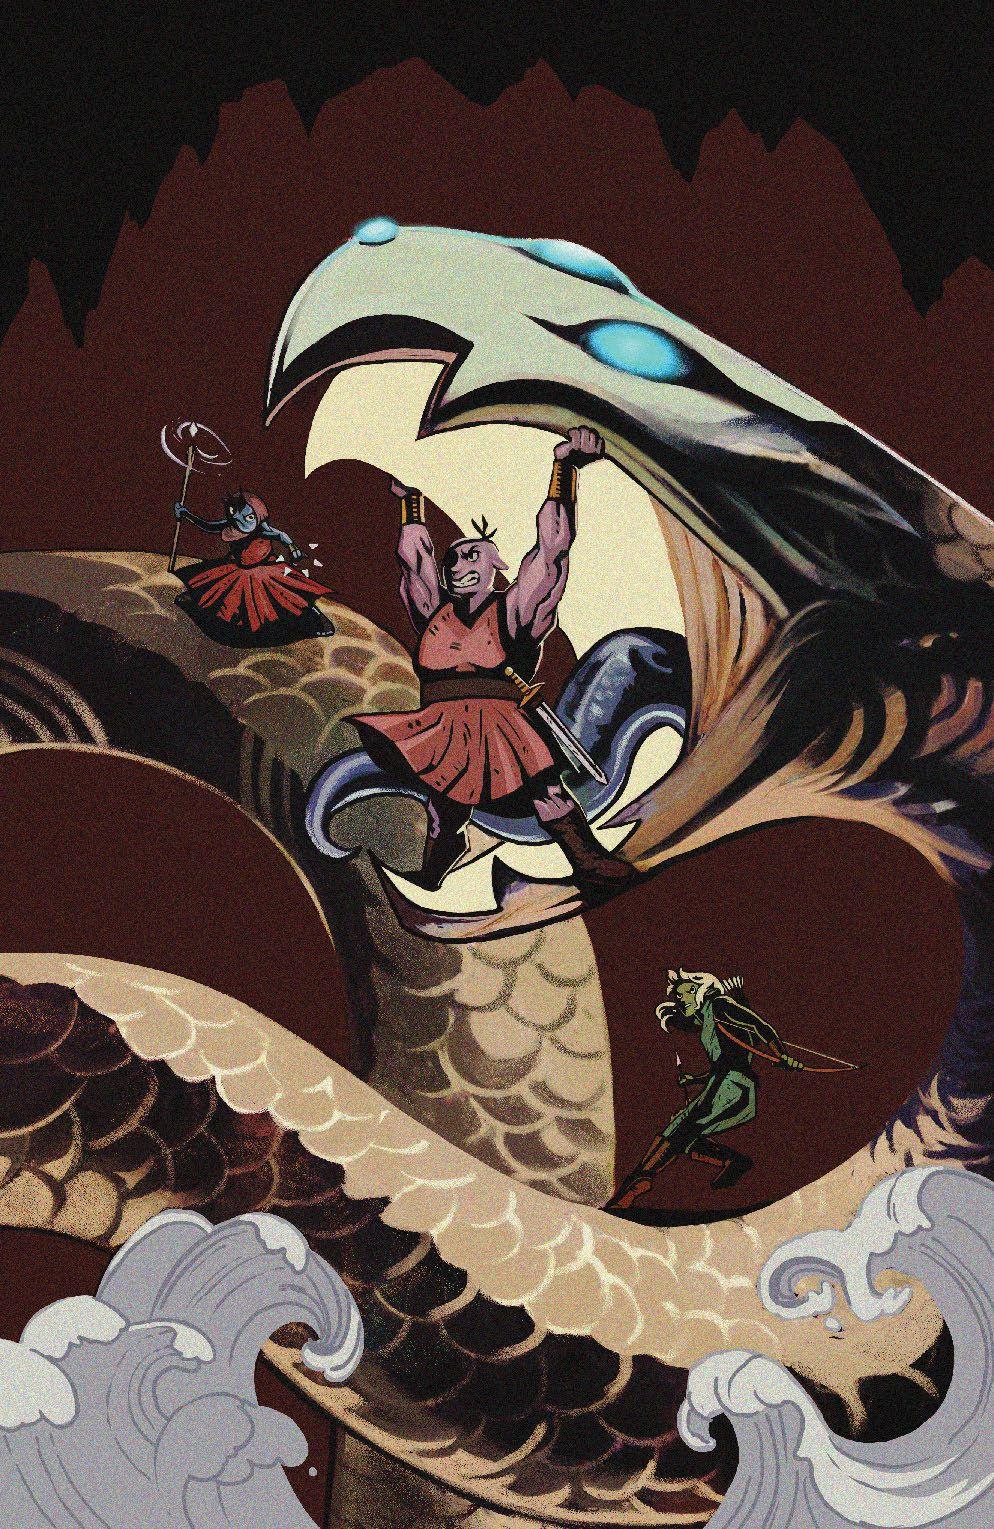 Orcs_006_Cover_C_Variant ComicList Previews: ORCS #6 (OF 6)